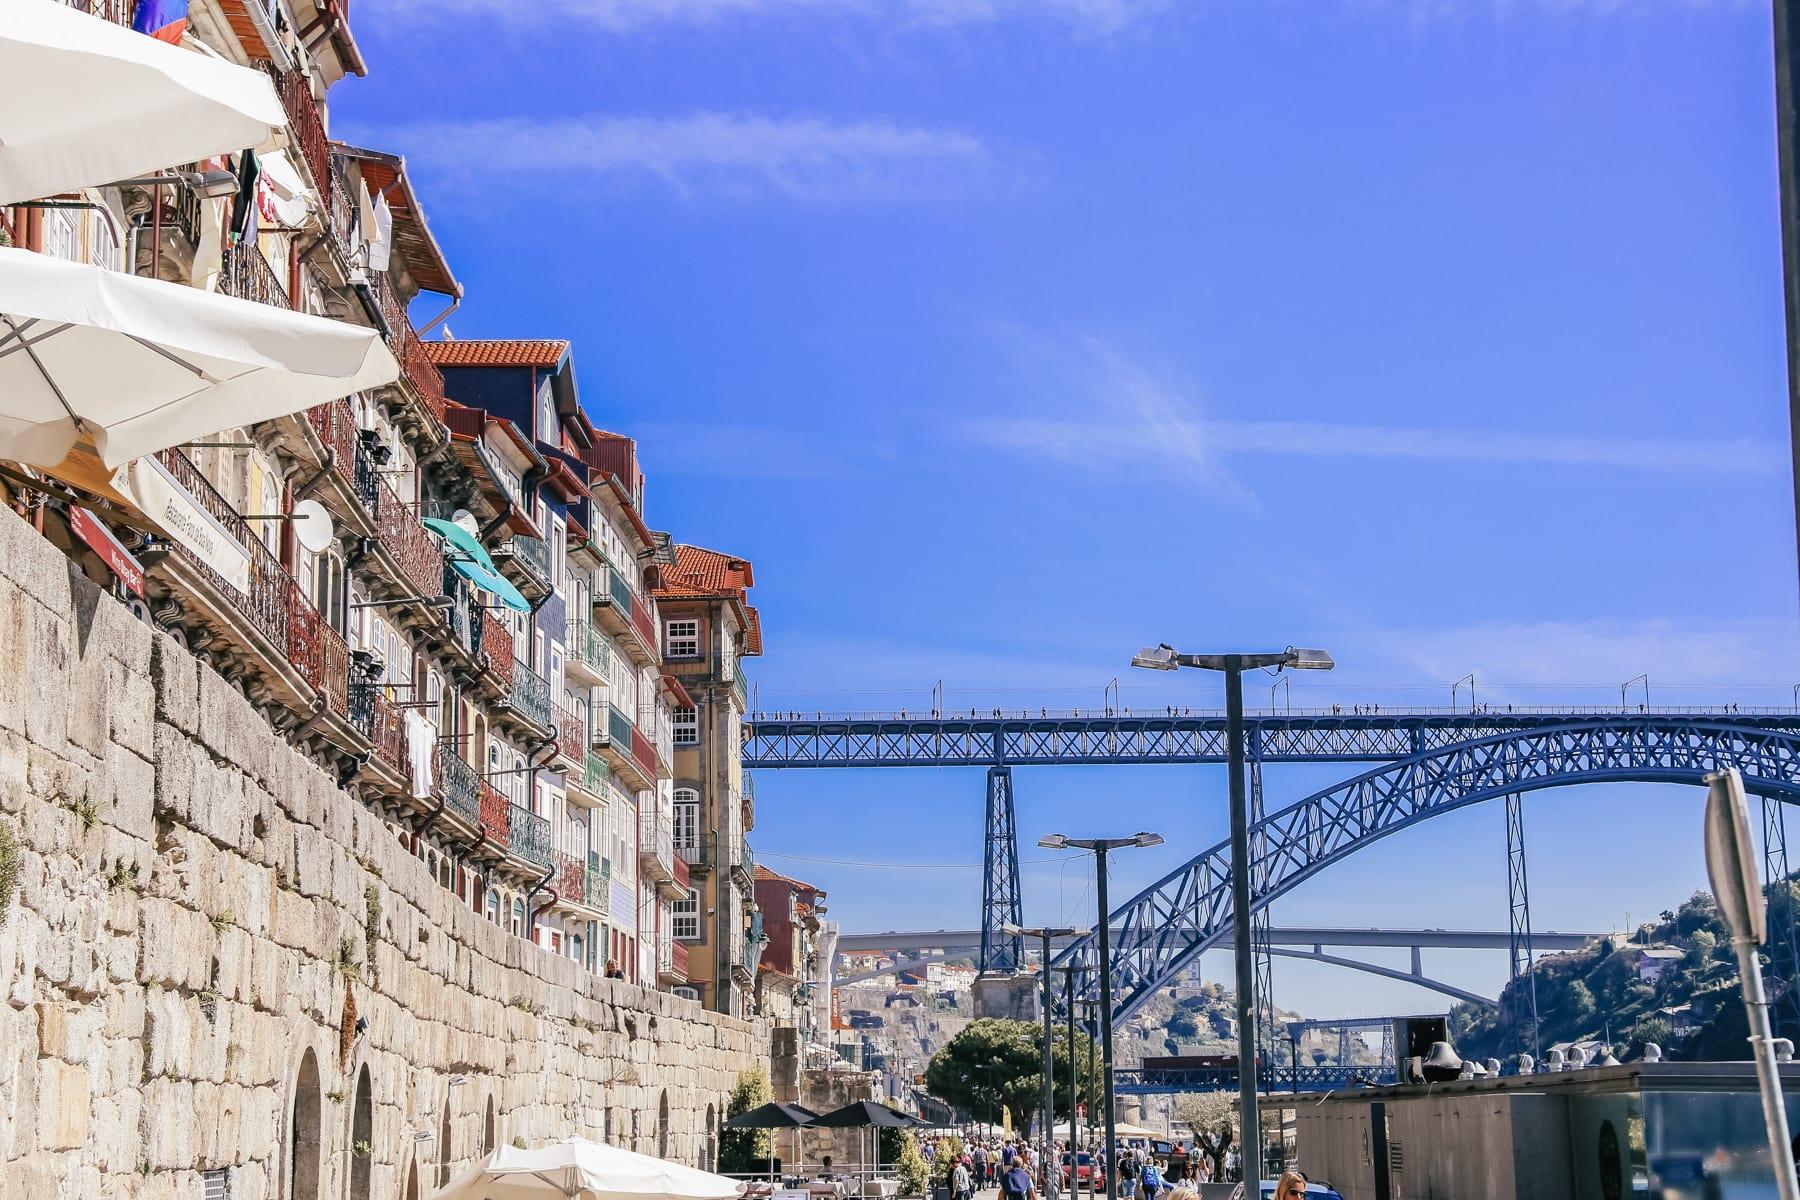 zehn-porto-tipps-fuer-deine-staedtereise-in-portugal-reiseblog-des-belles-choses 48